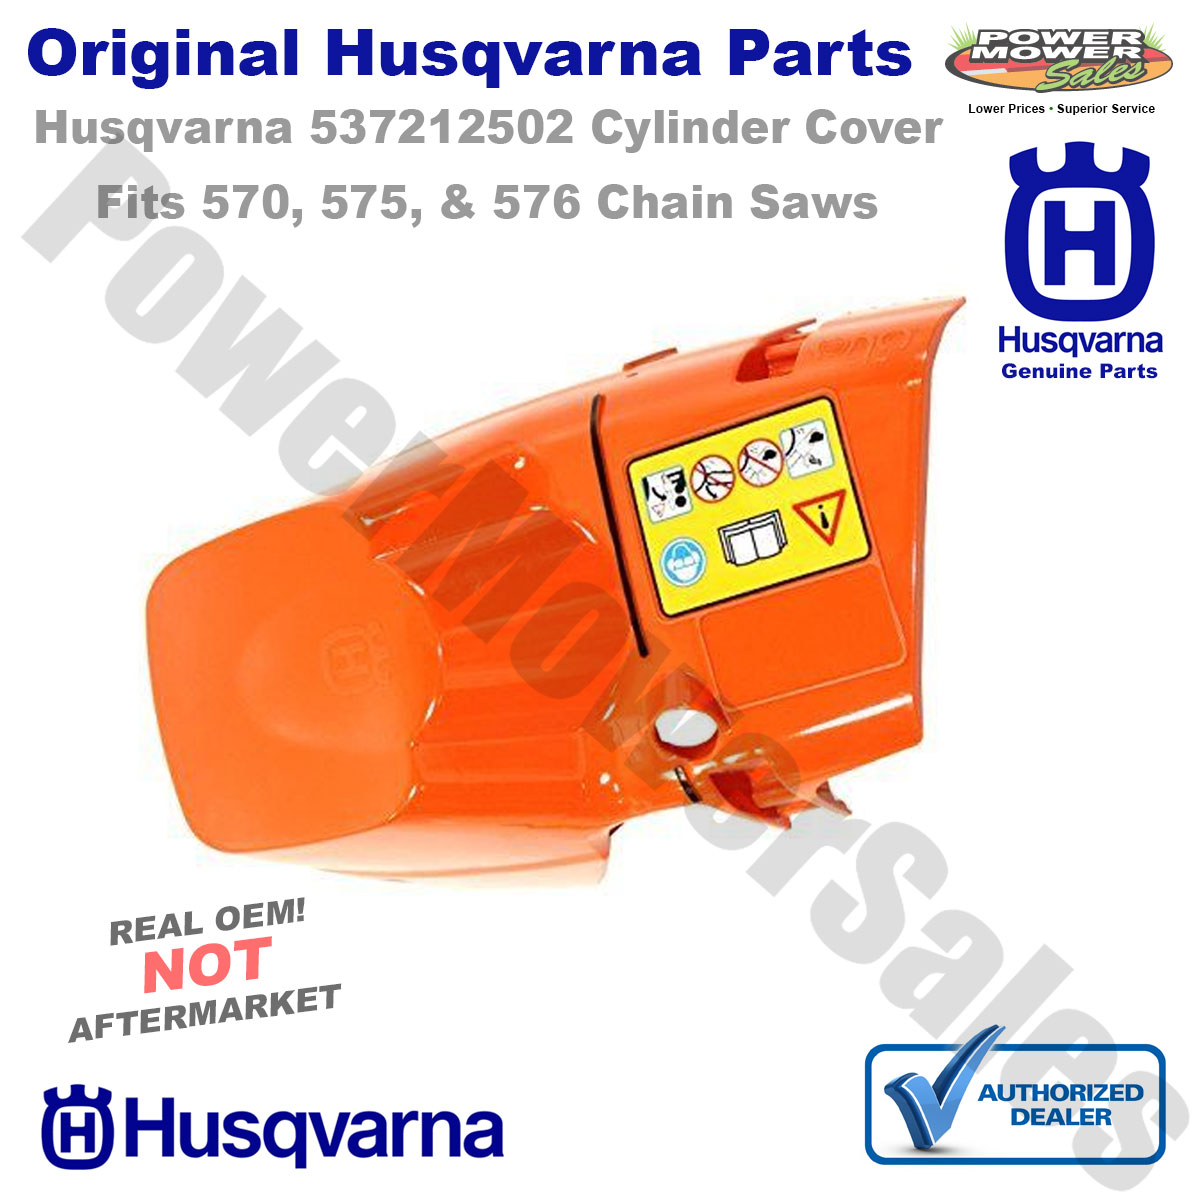 OEM Top Cylinder Cover Husqvarna 570 575 576 XP EPA Chainsaws 537212502